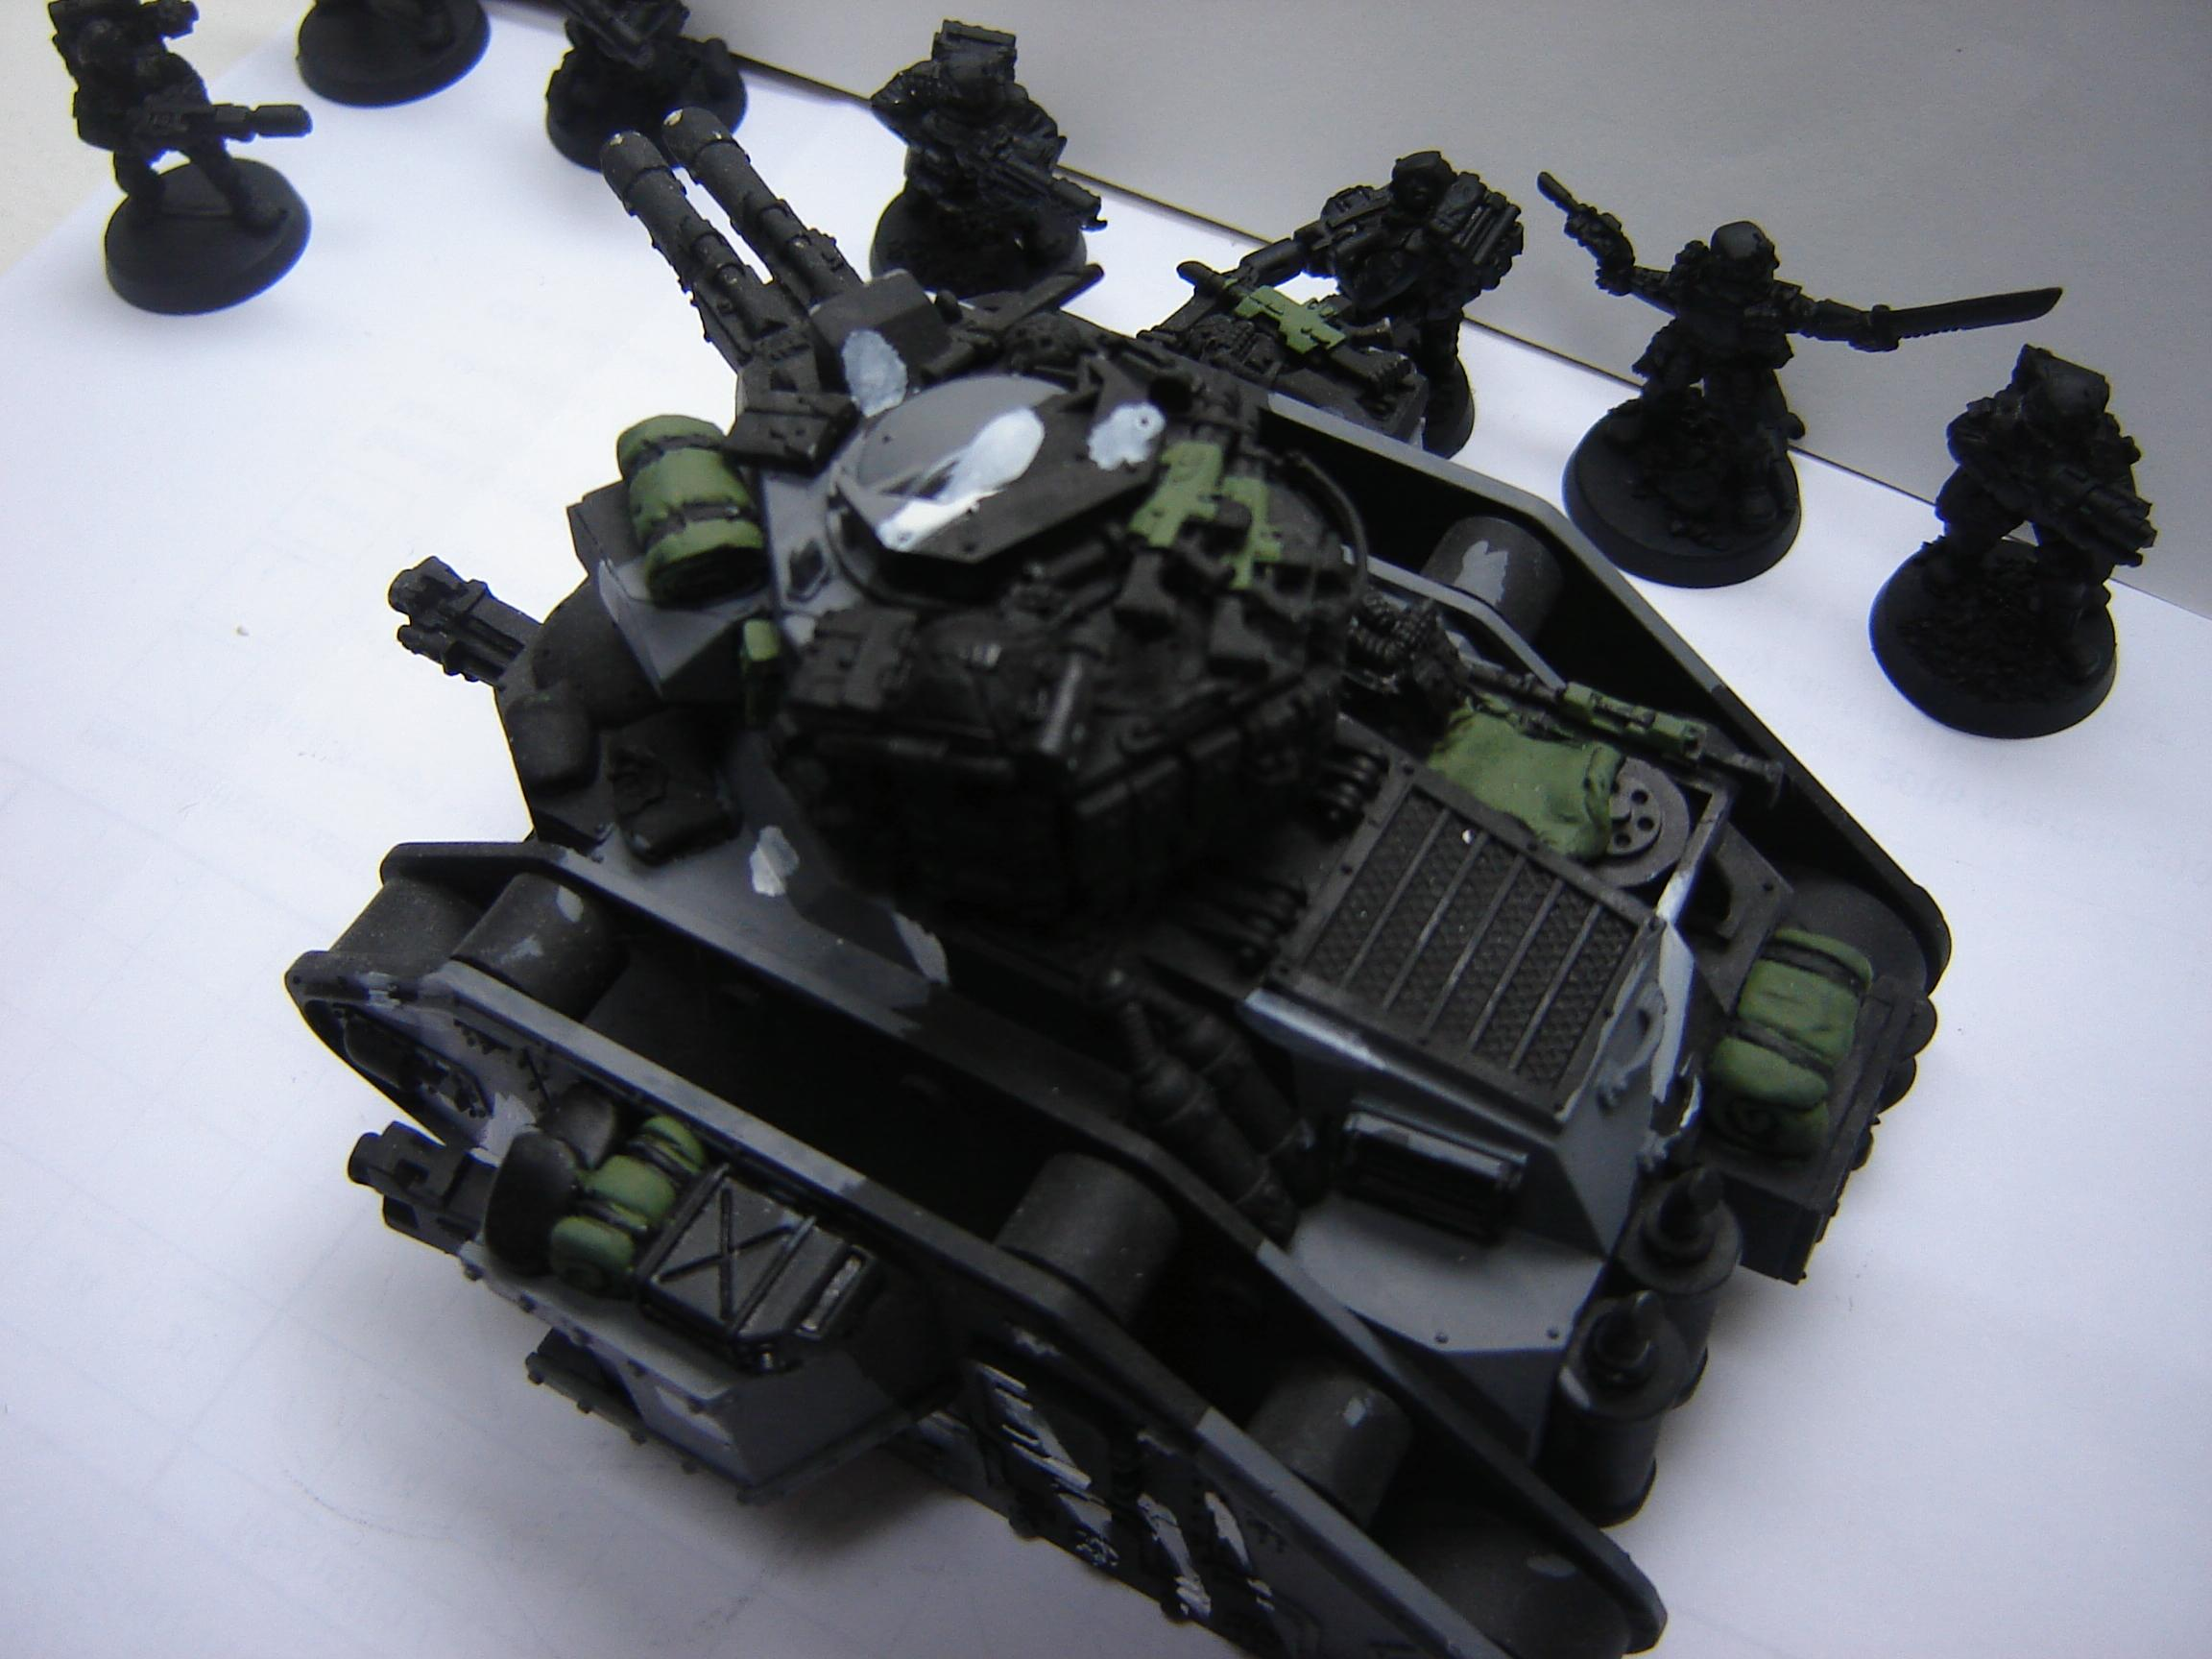 Armored Company, Basilisk, Hellhound, Imperial Guard, Leman Russ, Urban Camo